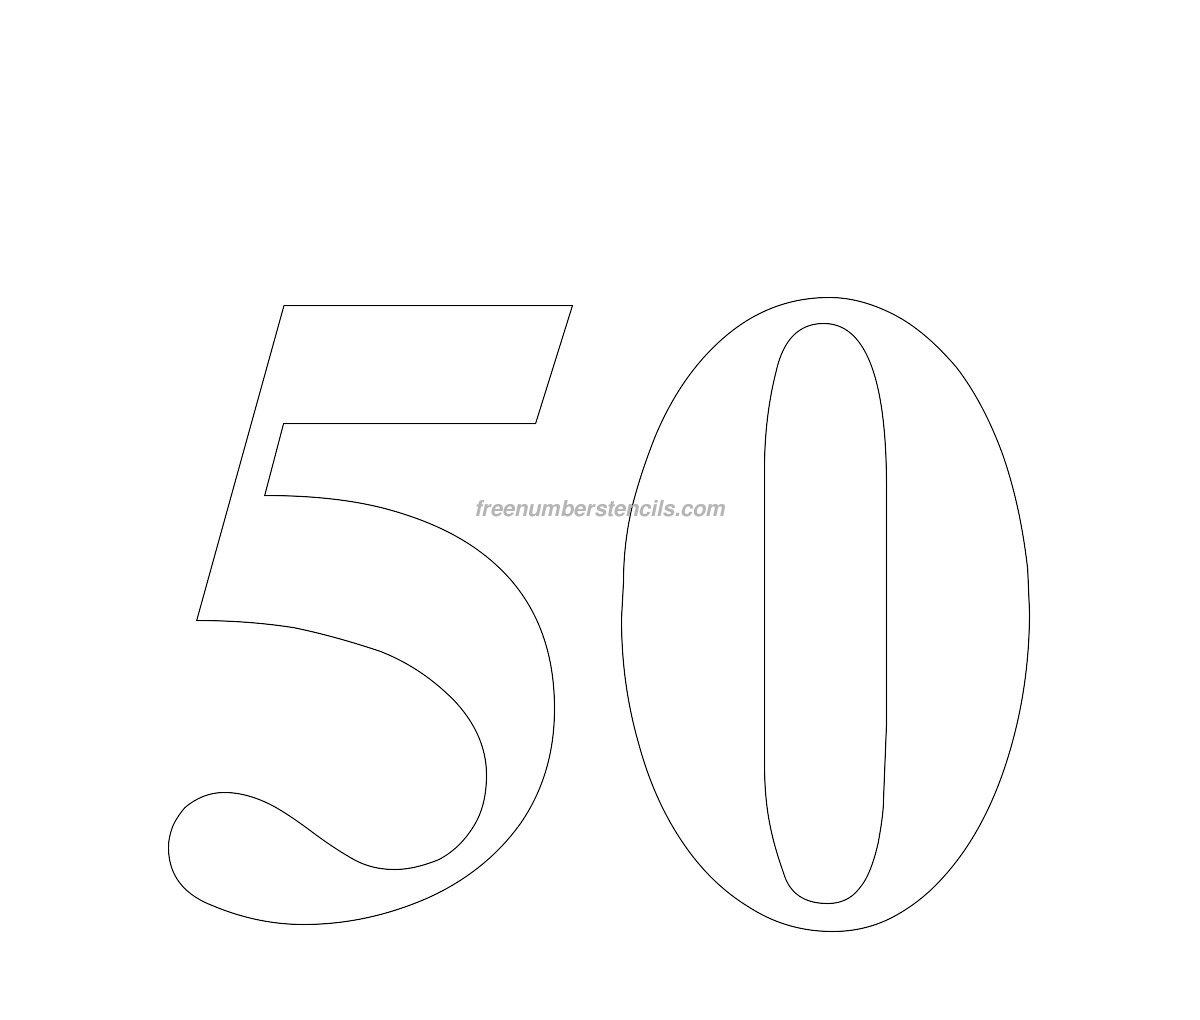 Free Huge 50 Number Stencil Freenumberstencils